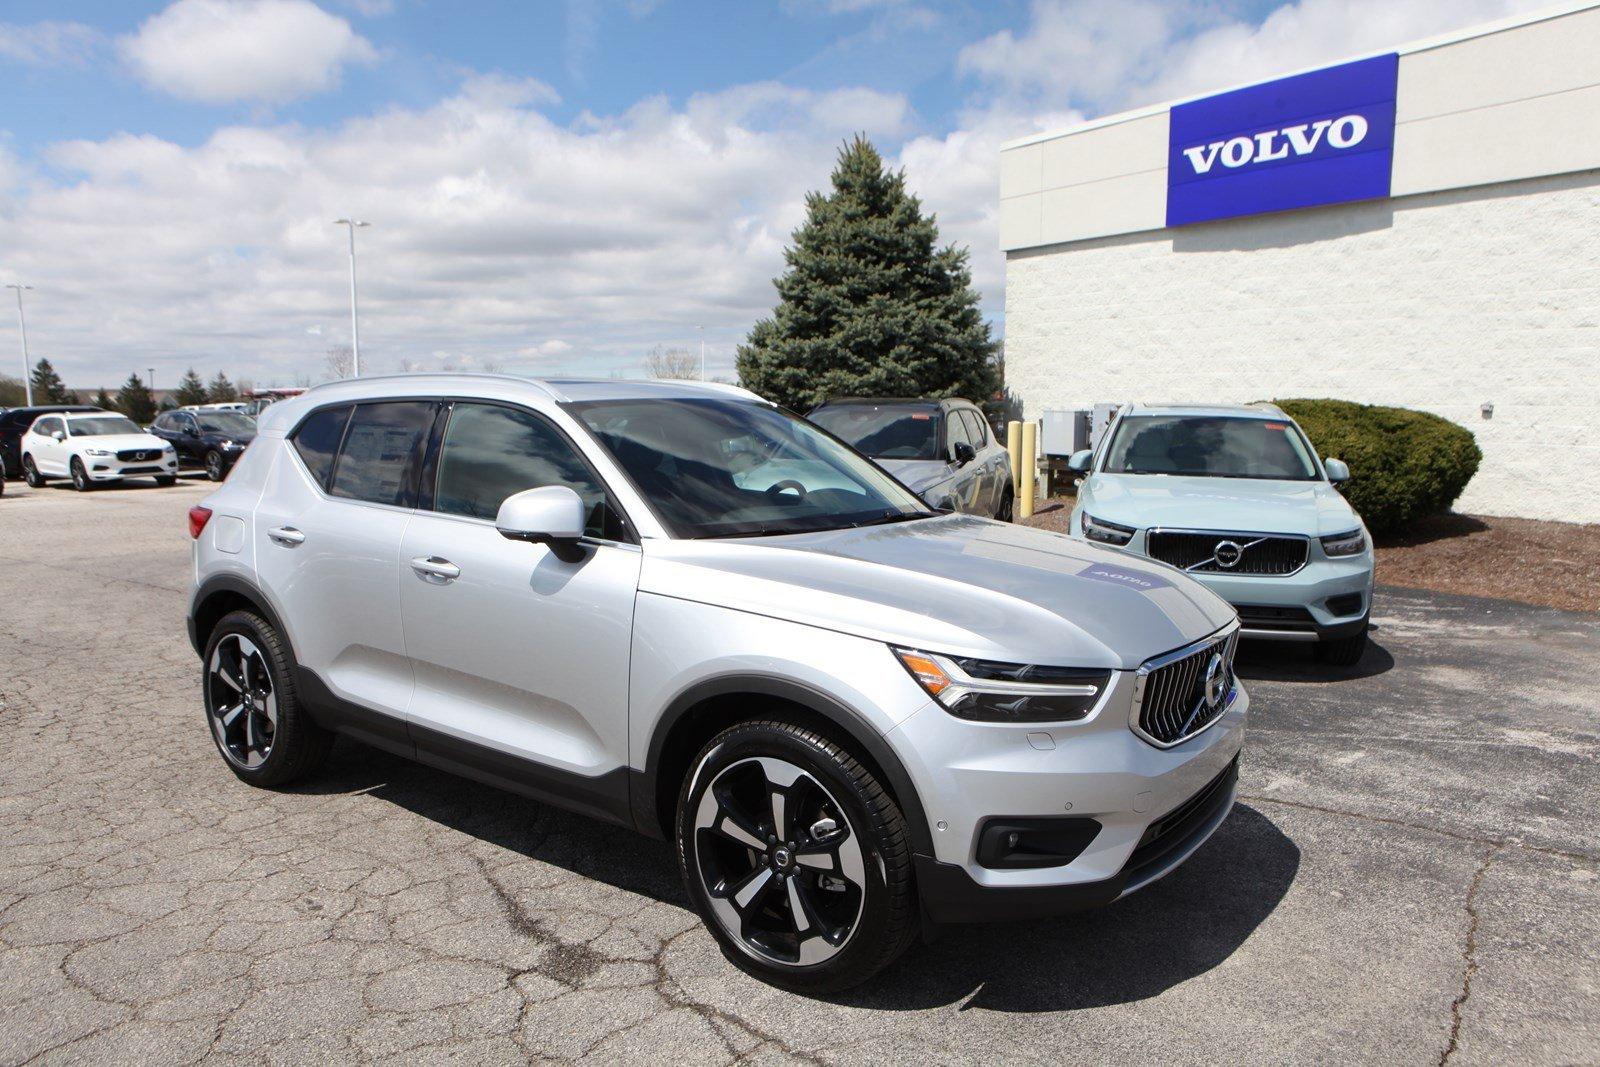 New 2019 Volvo XC40 For Sale in Perrysburg | VIN: YV4162UL9K2123819